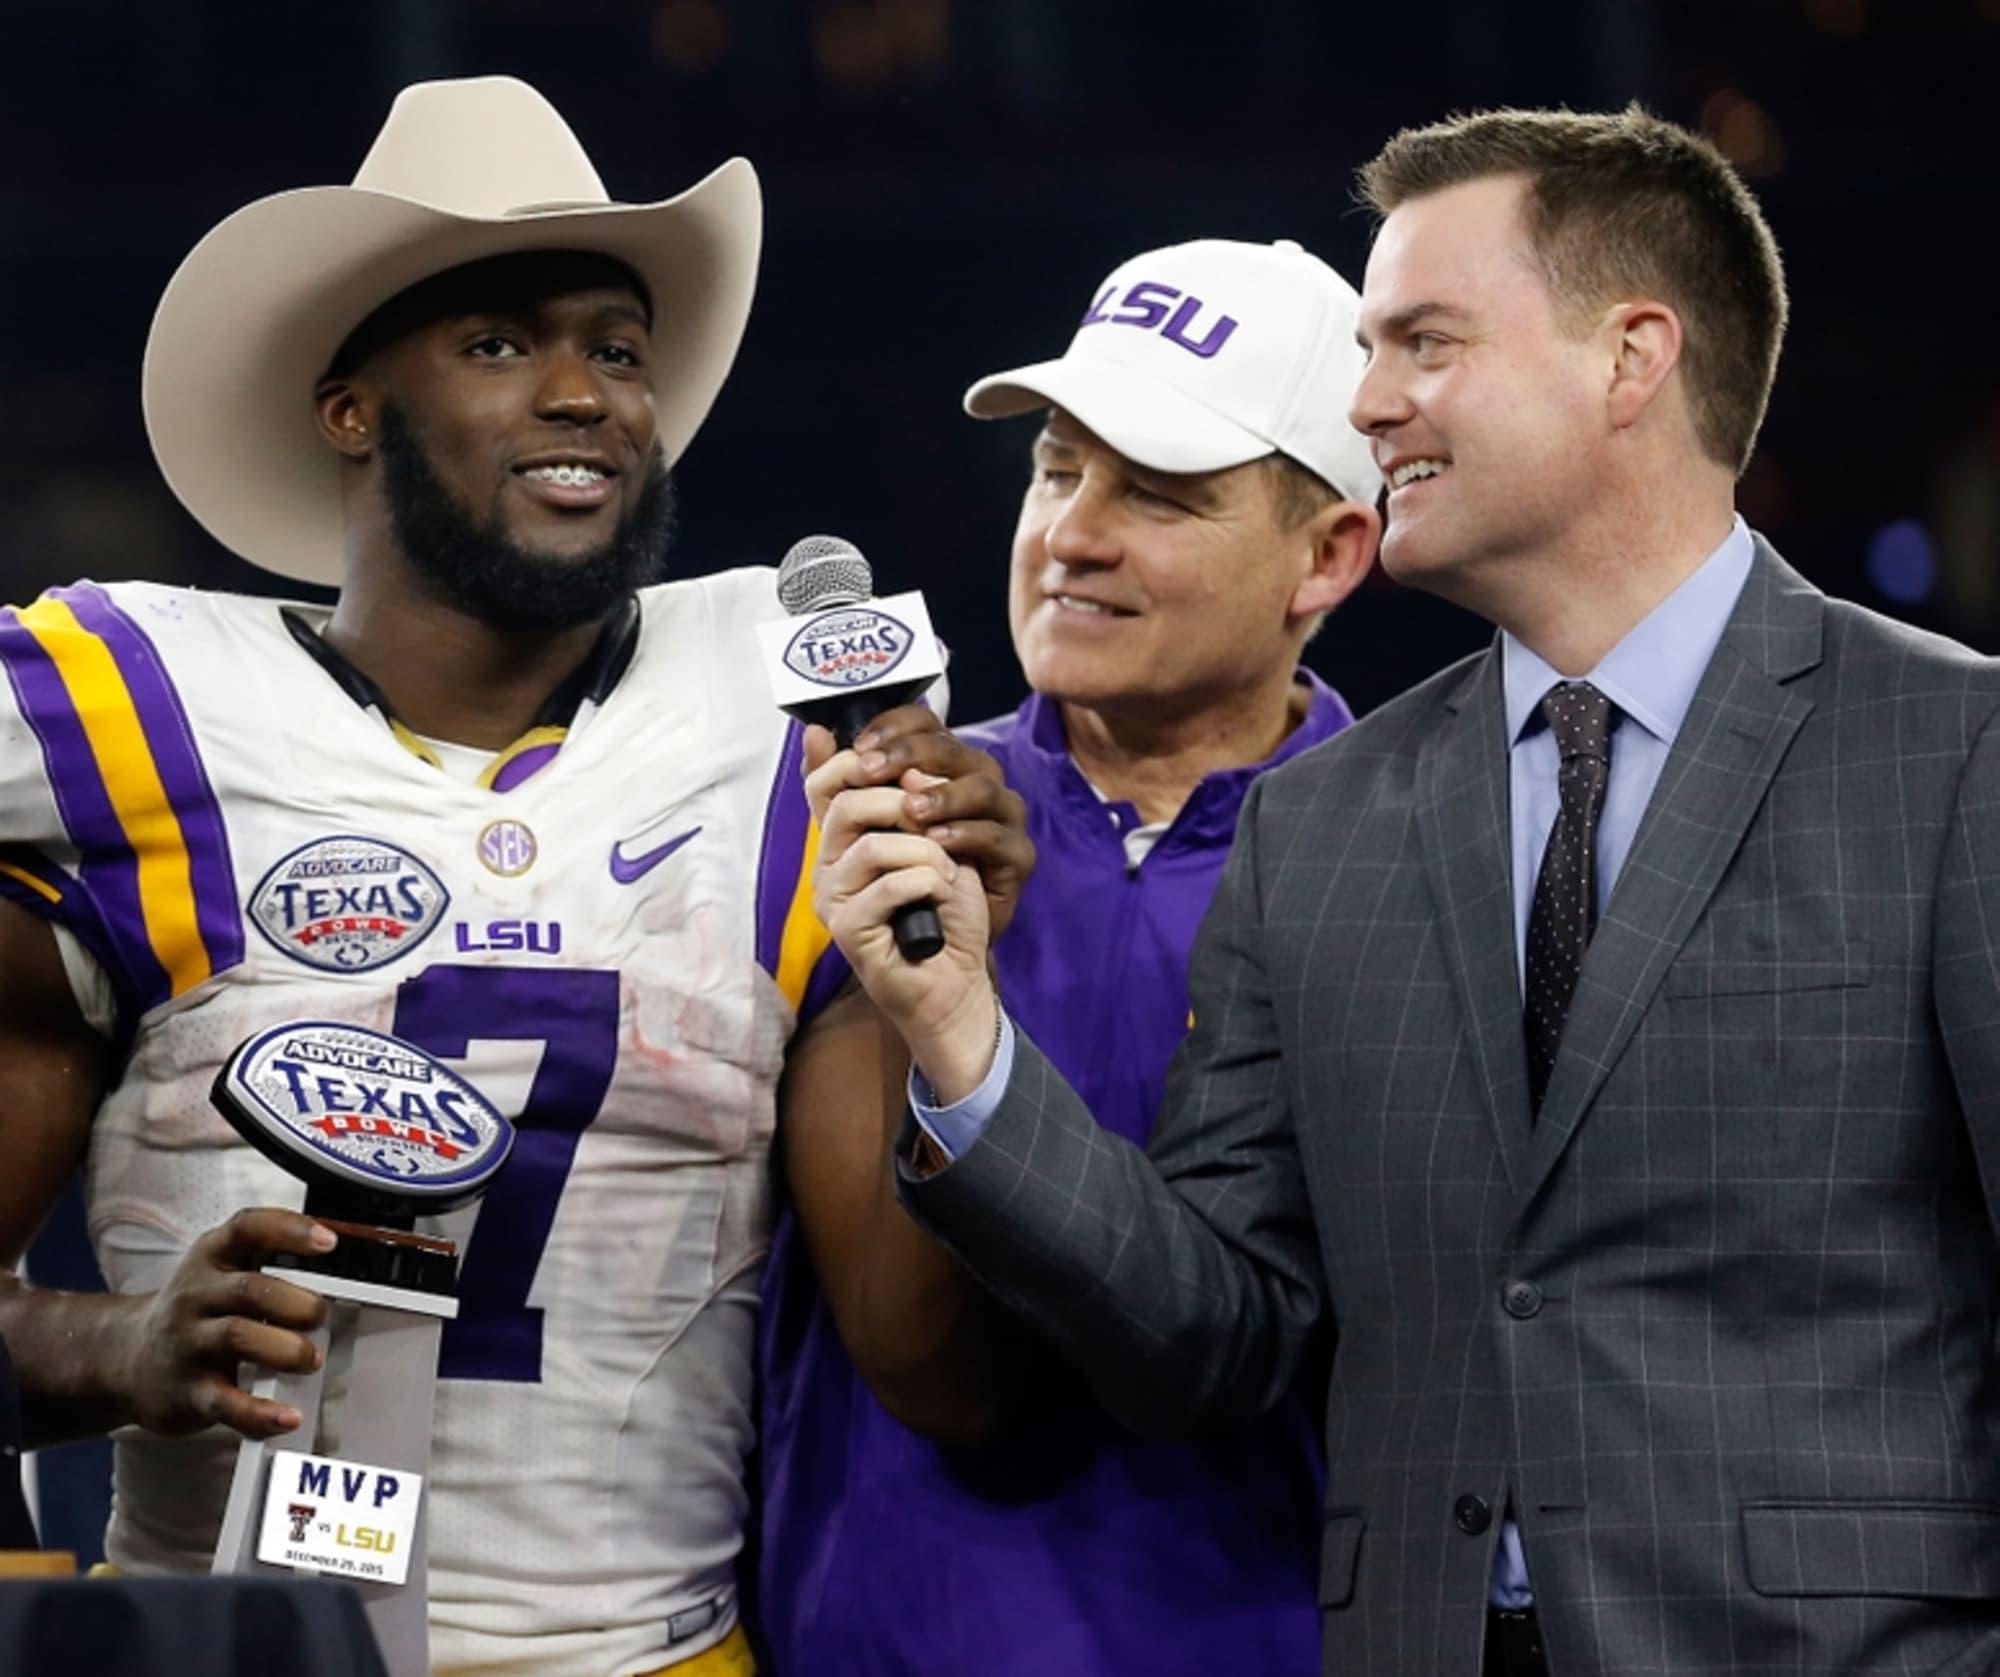 2017 NFL Draft: Top 3 Running Back Prospects